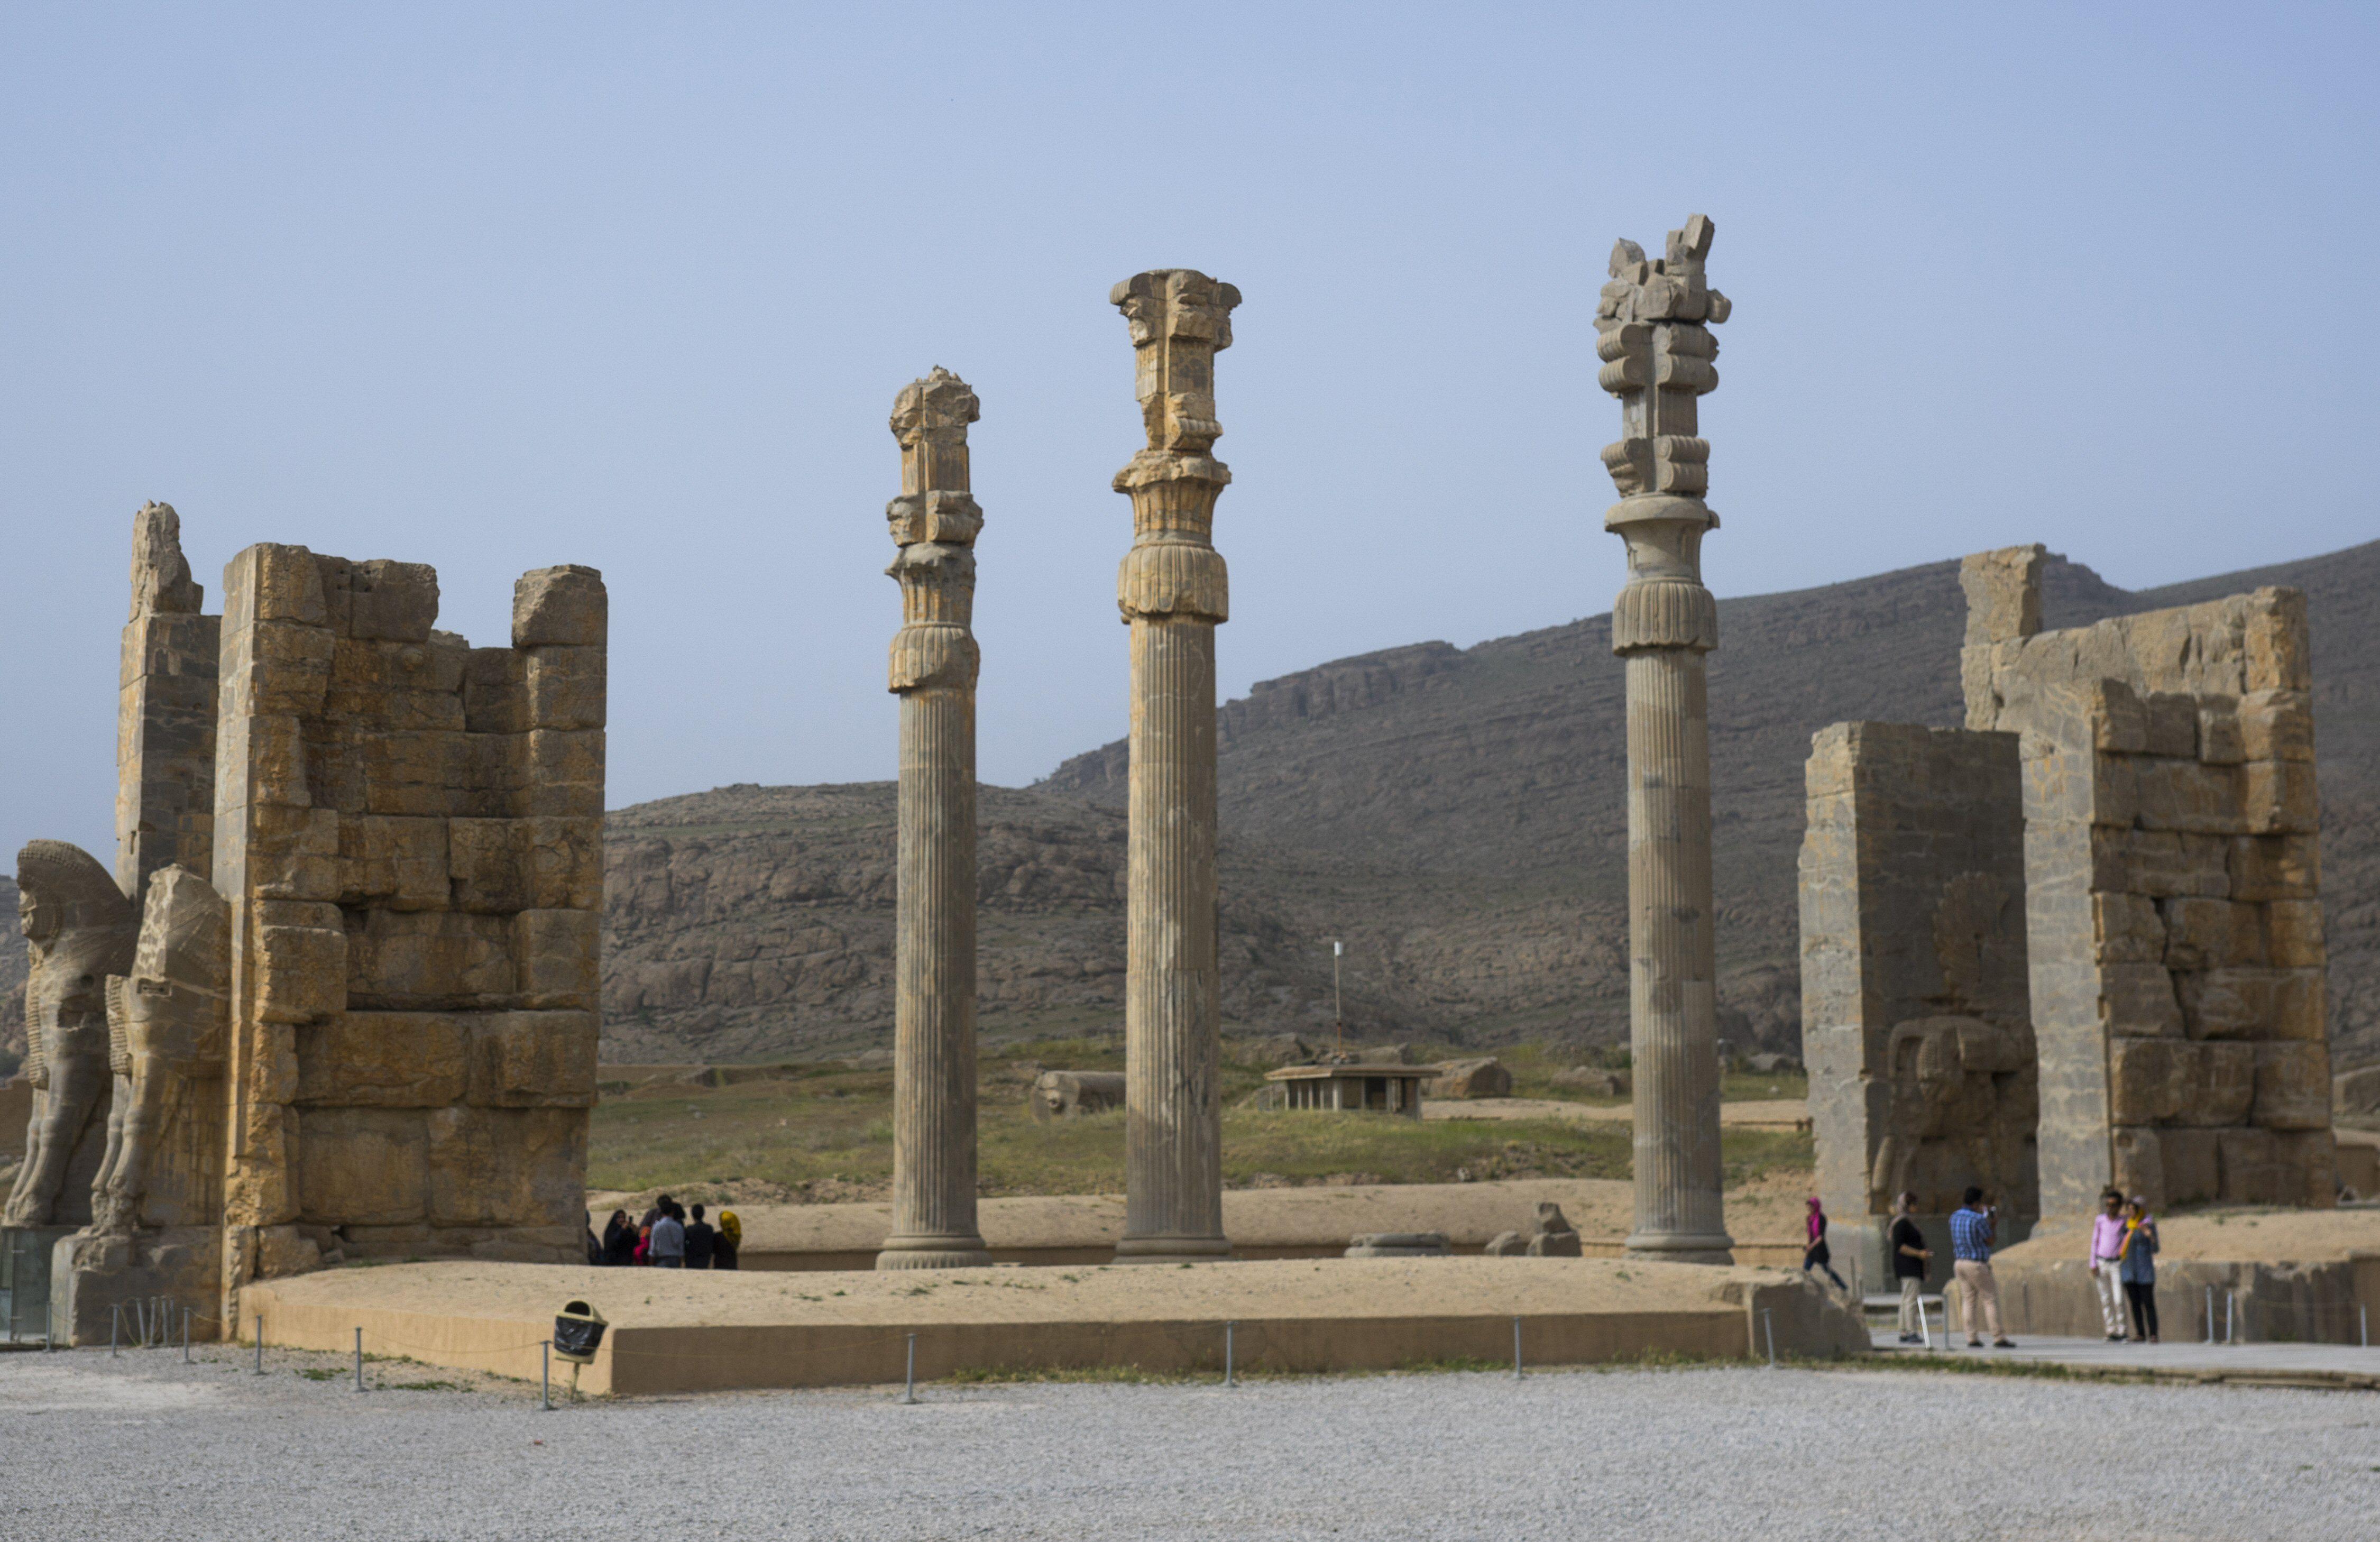 ancient ruins, three tall columns with animal capitals